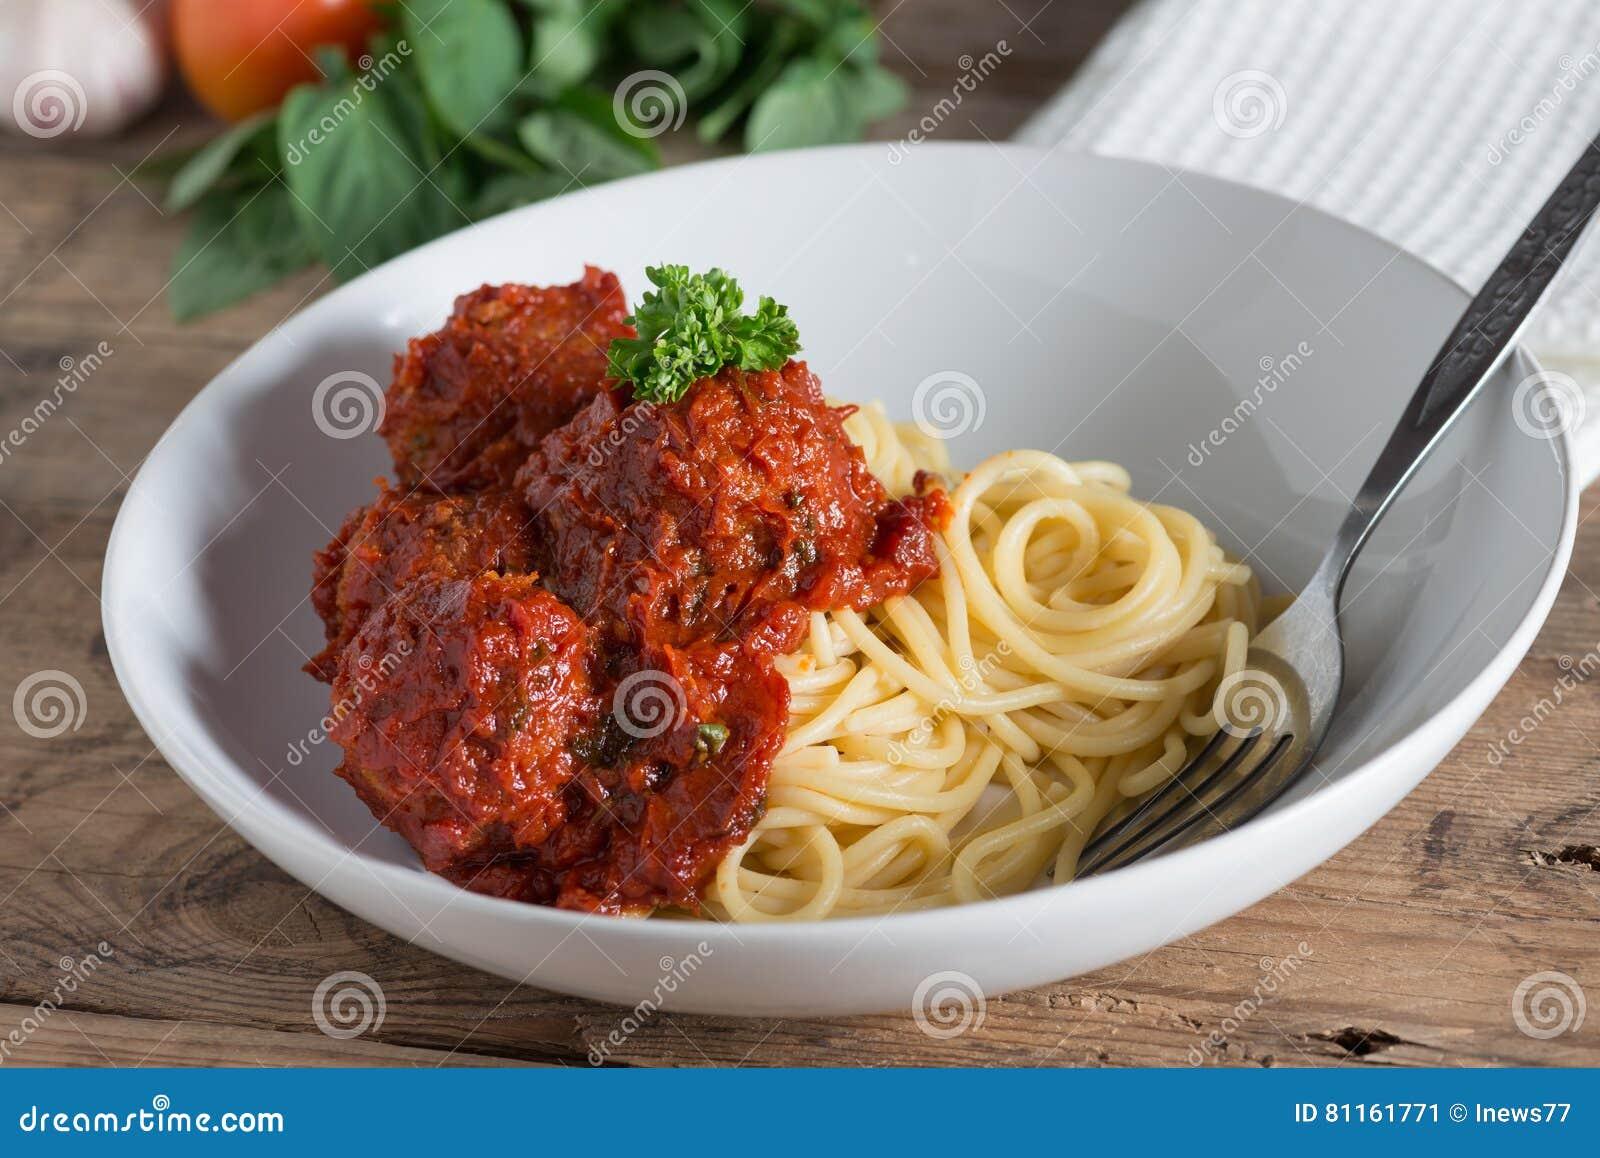 Спагетти и фрикадельки в белой плите